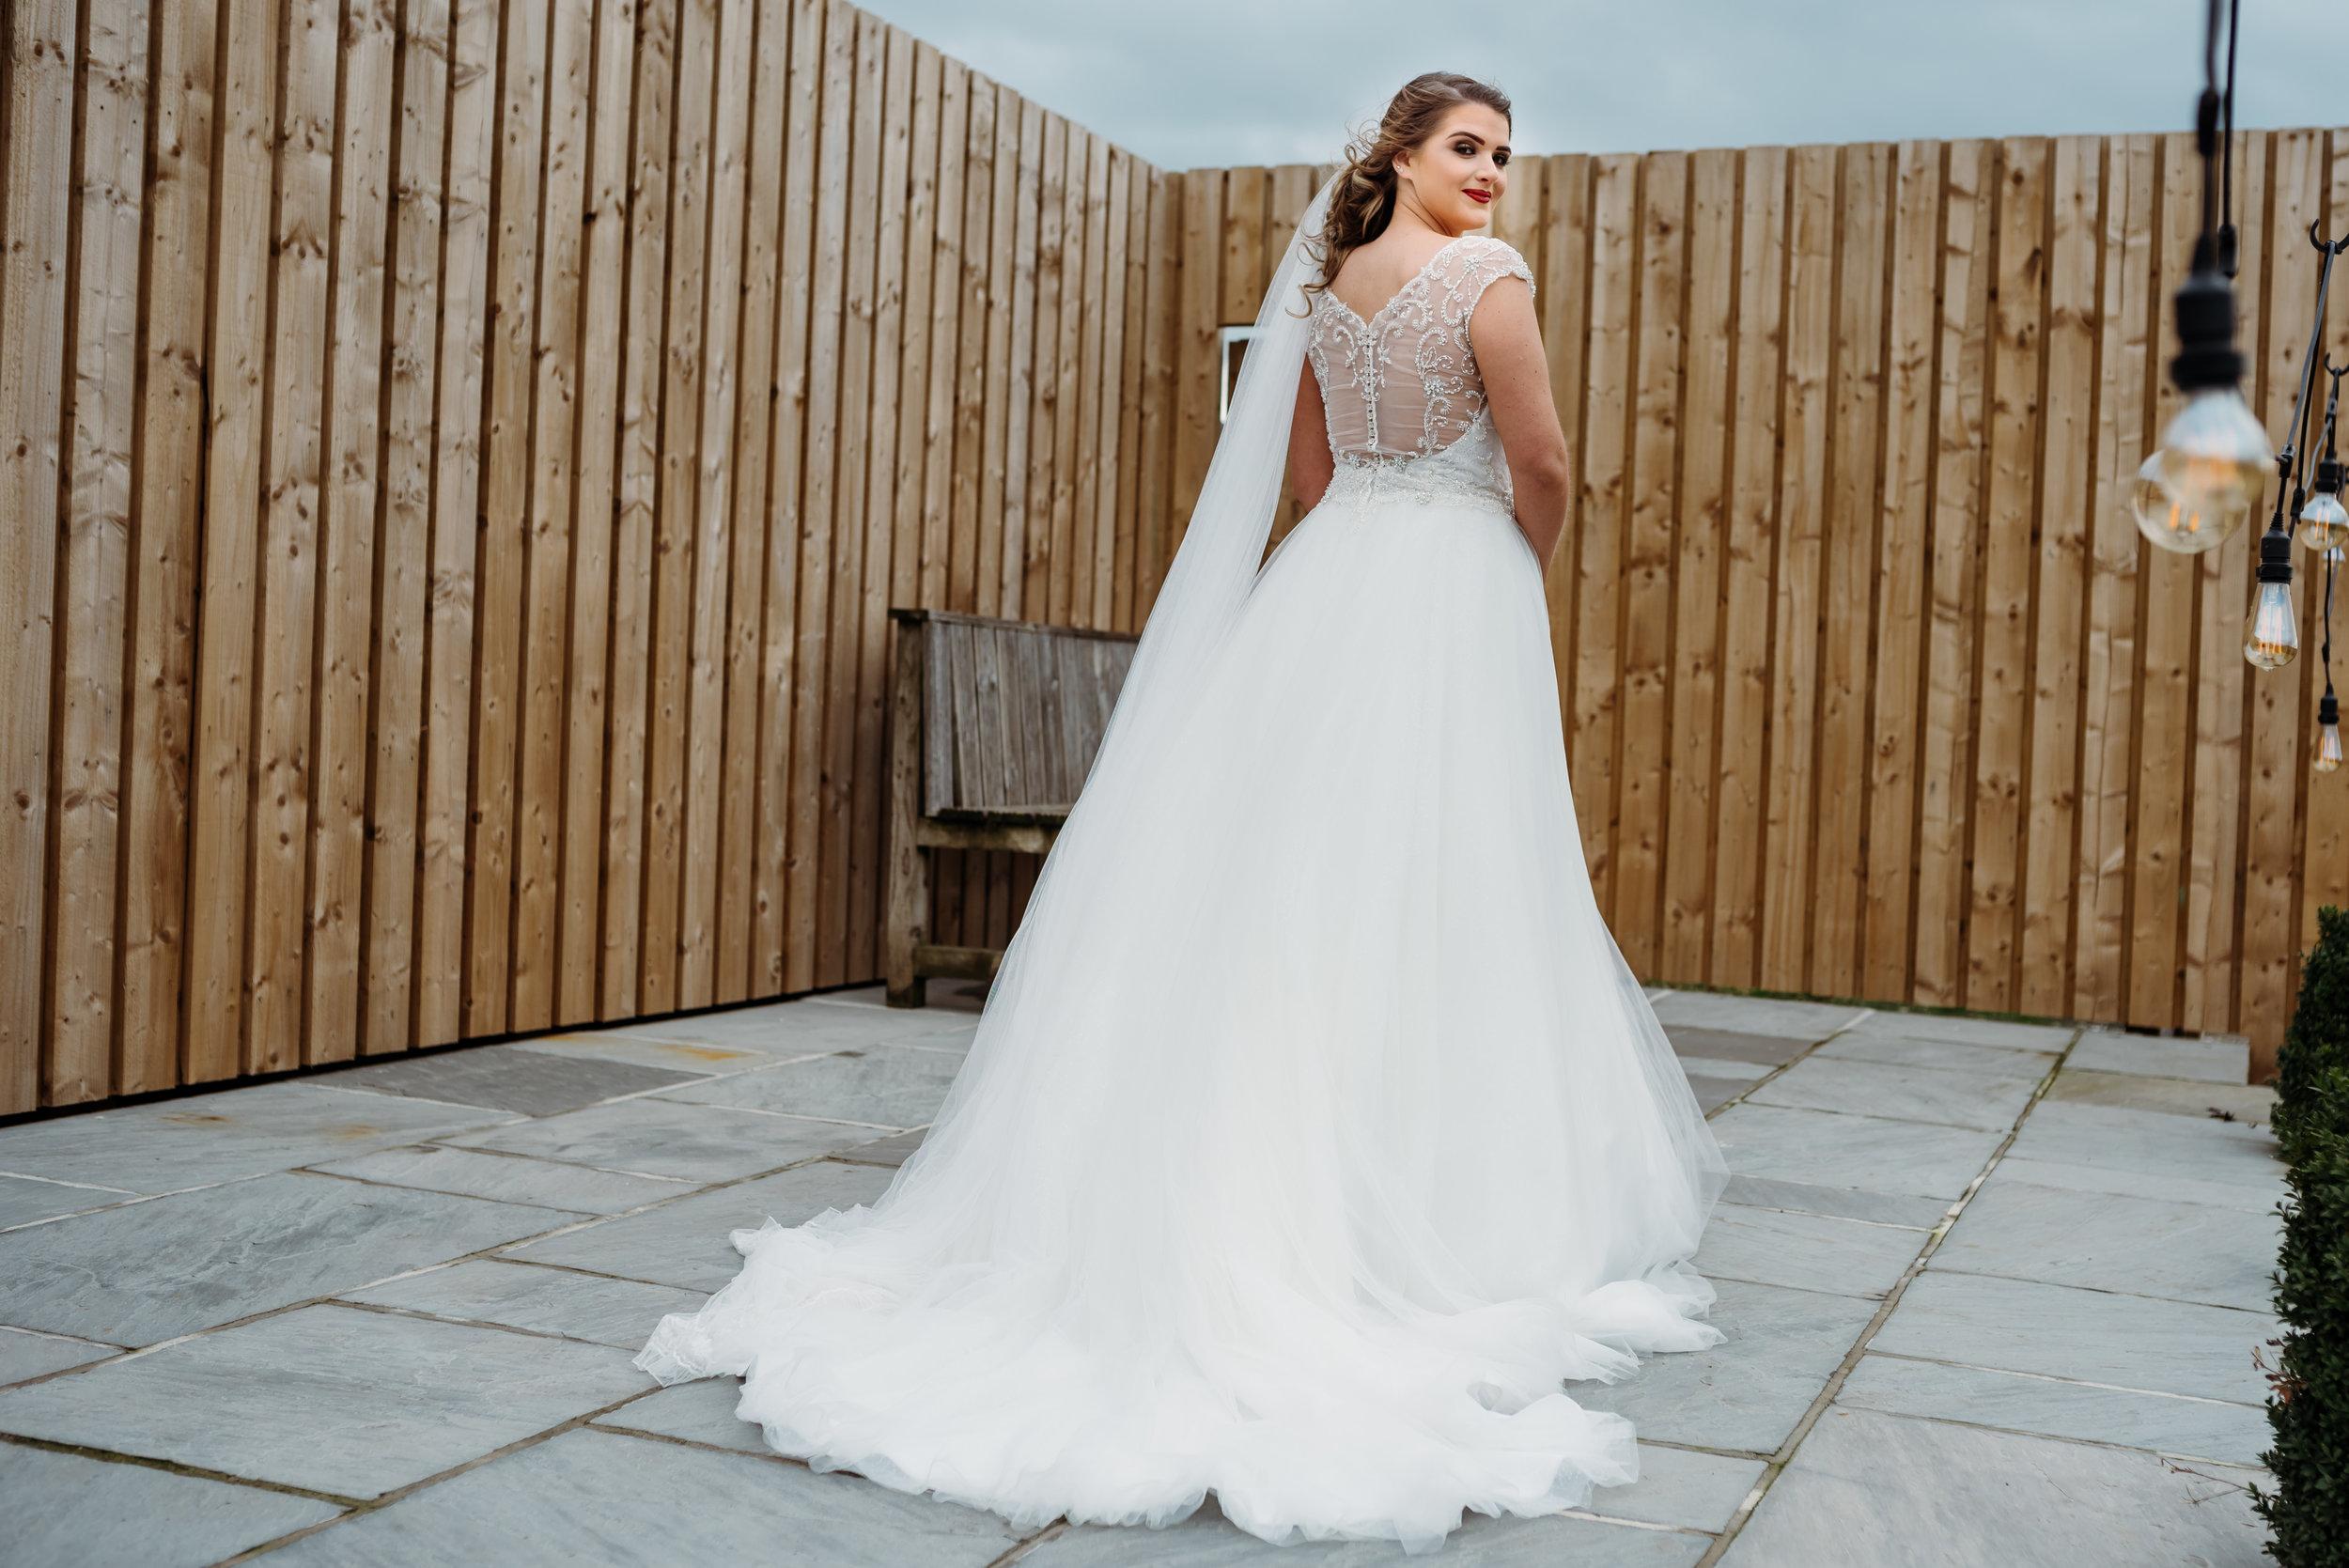 Princess wedding - clitheroe